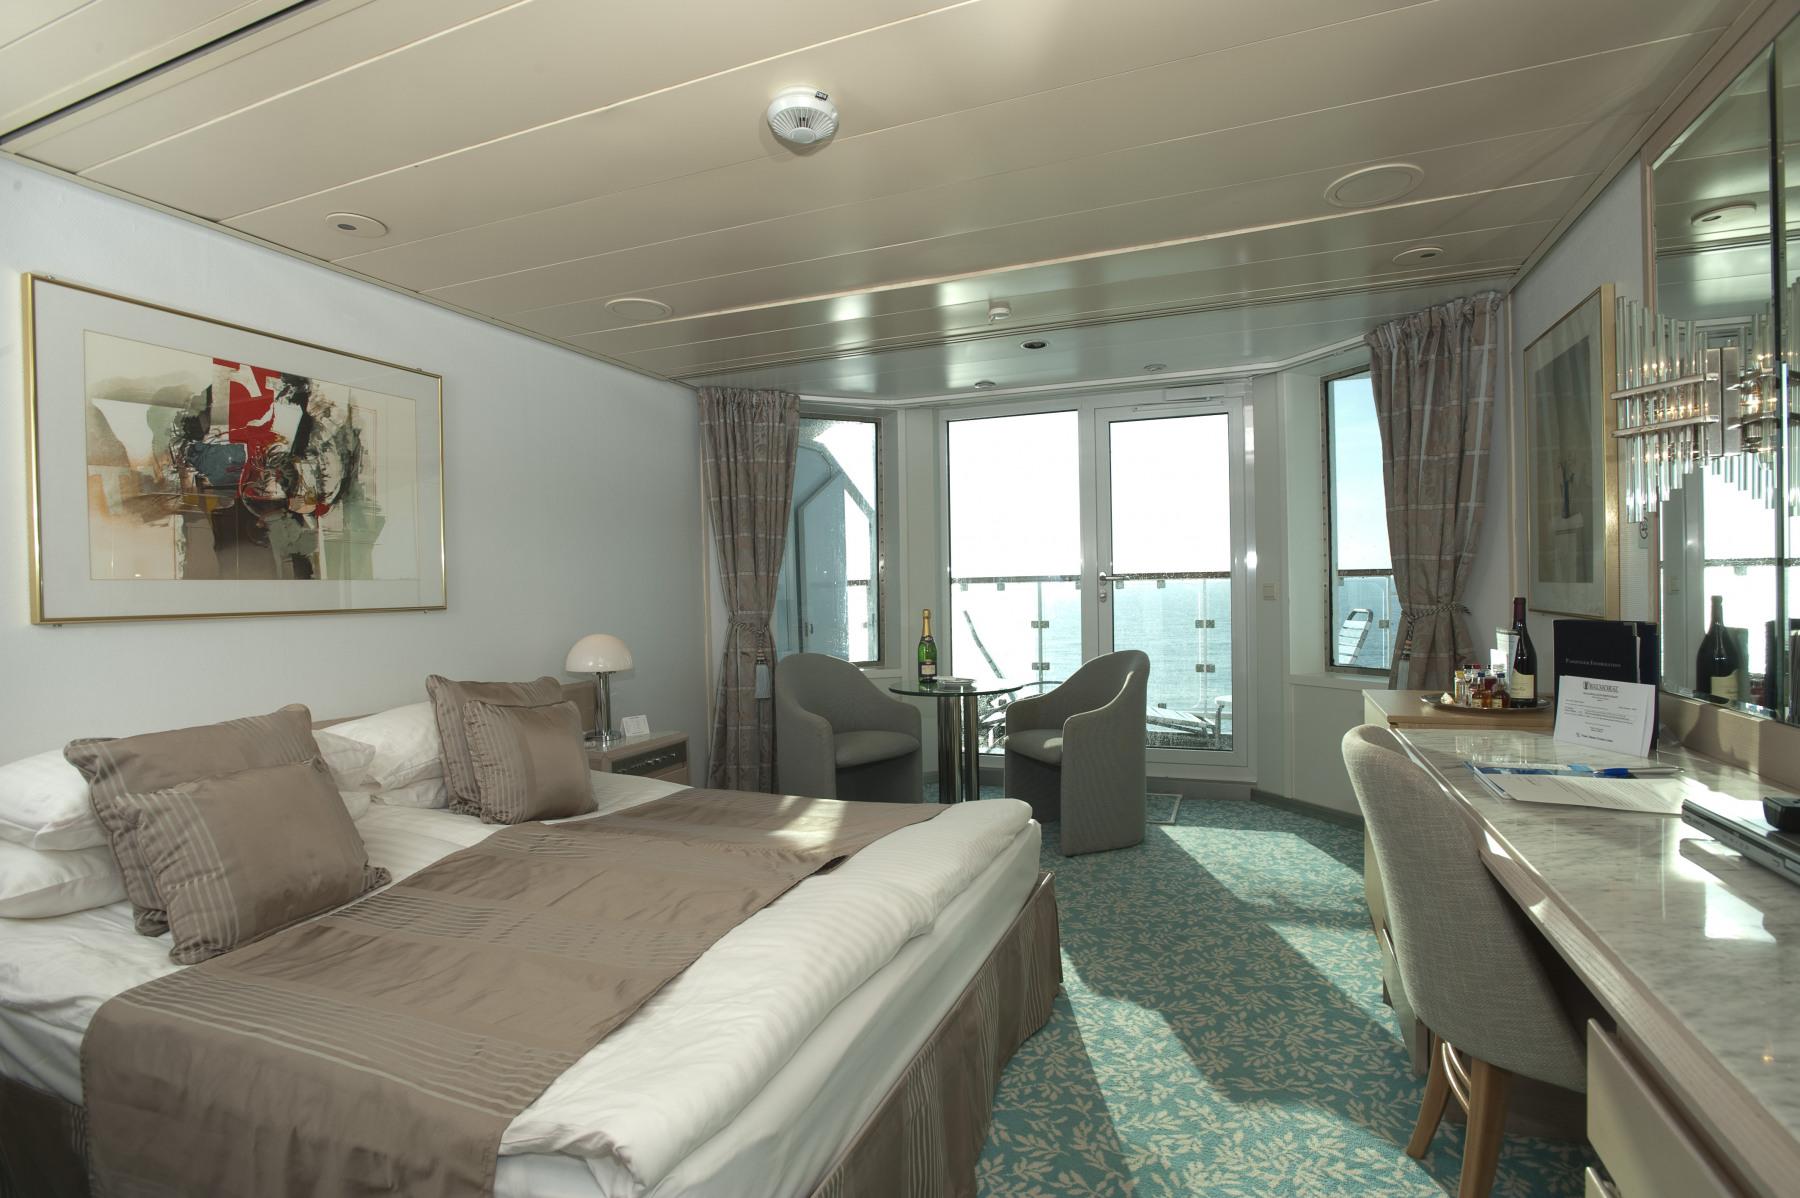 fred olsen cruise lines balmoral balcony cabins 2014.jpg